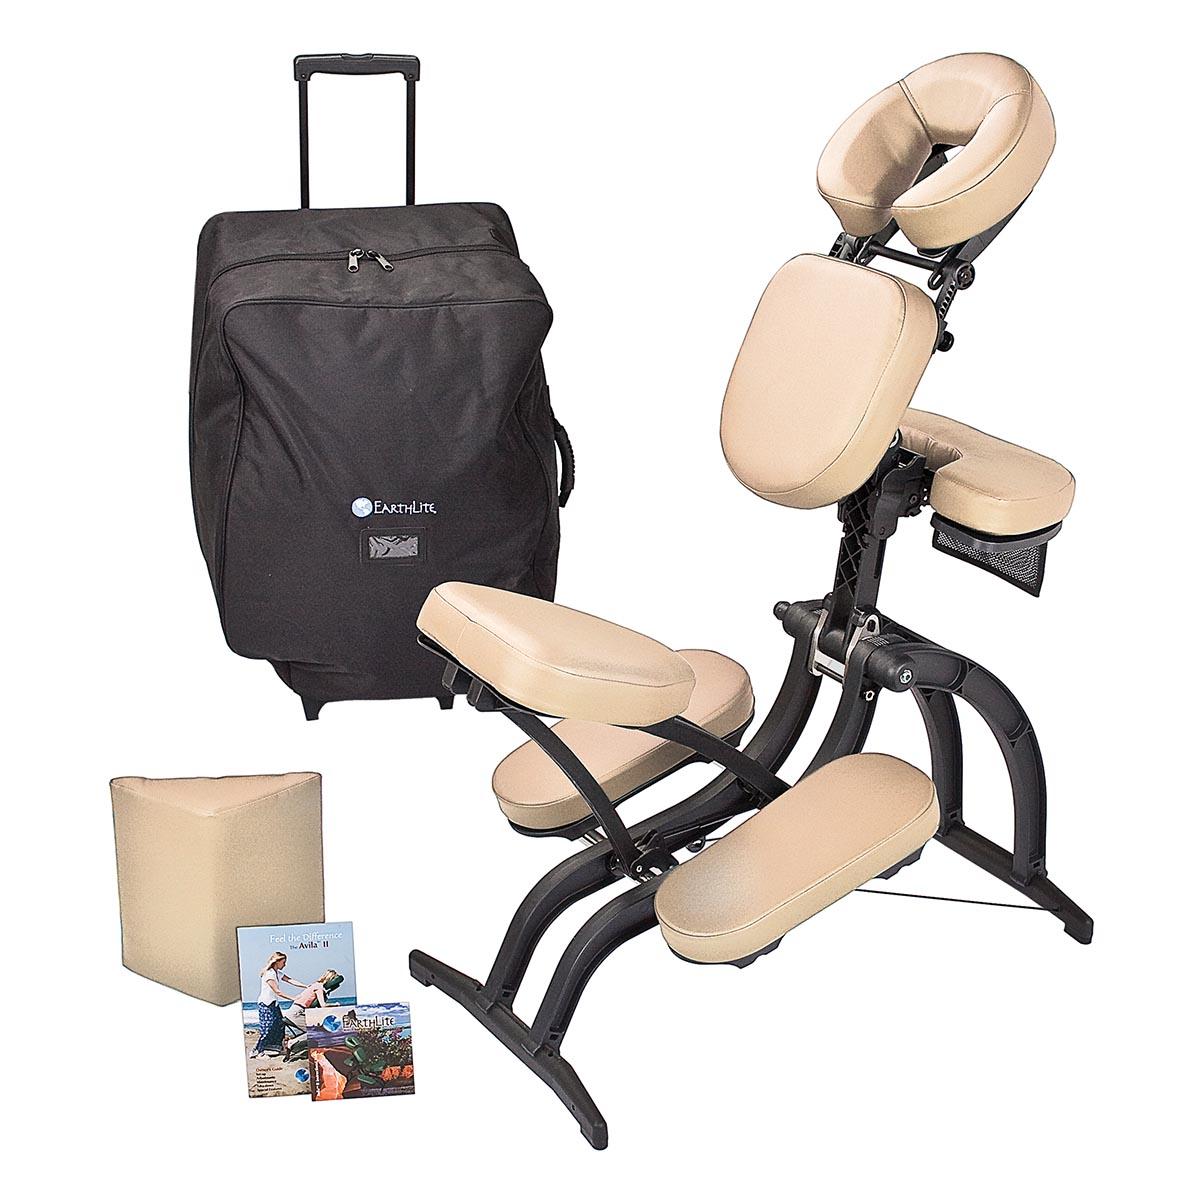 Earthlite avila ii portable massage chair massage chairs for Chair massage